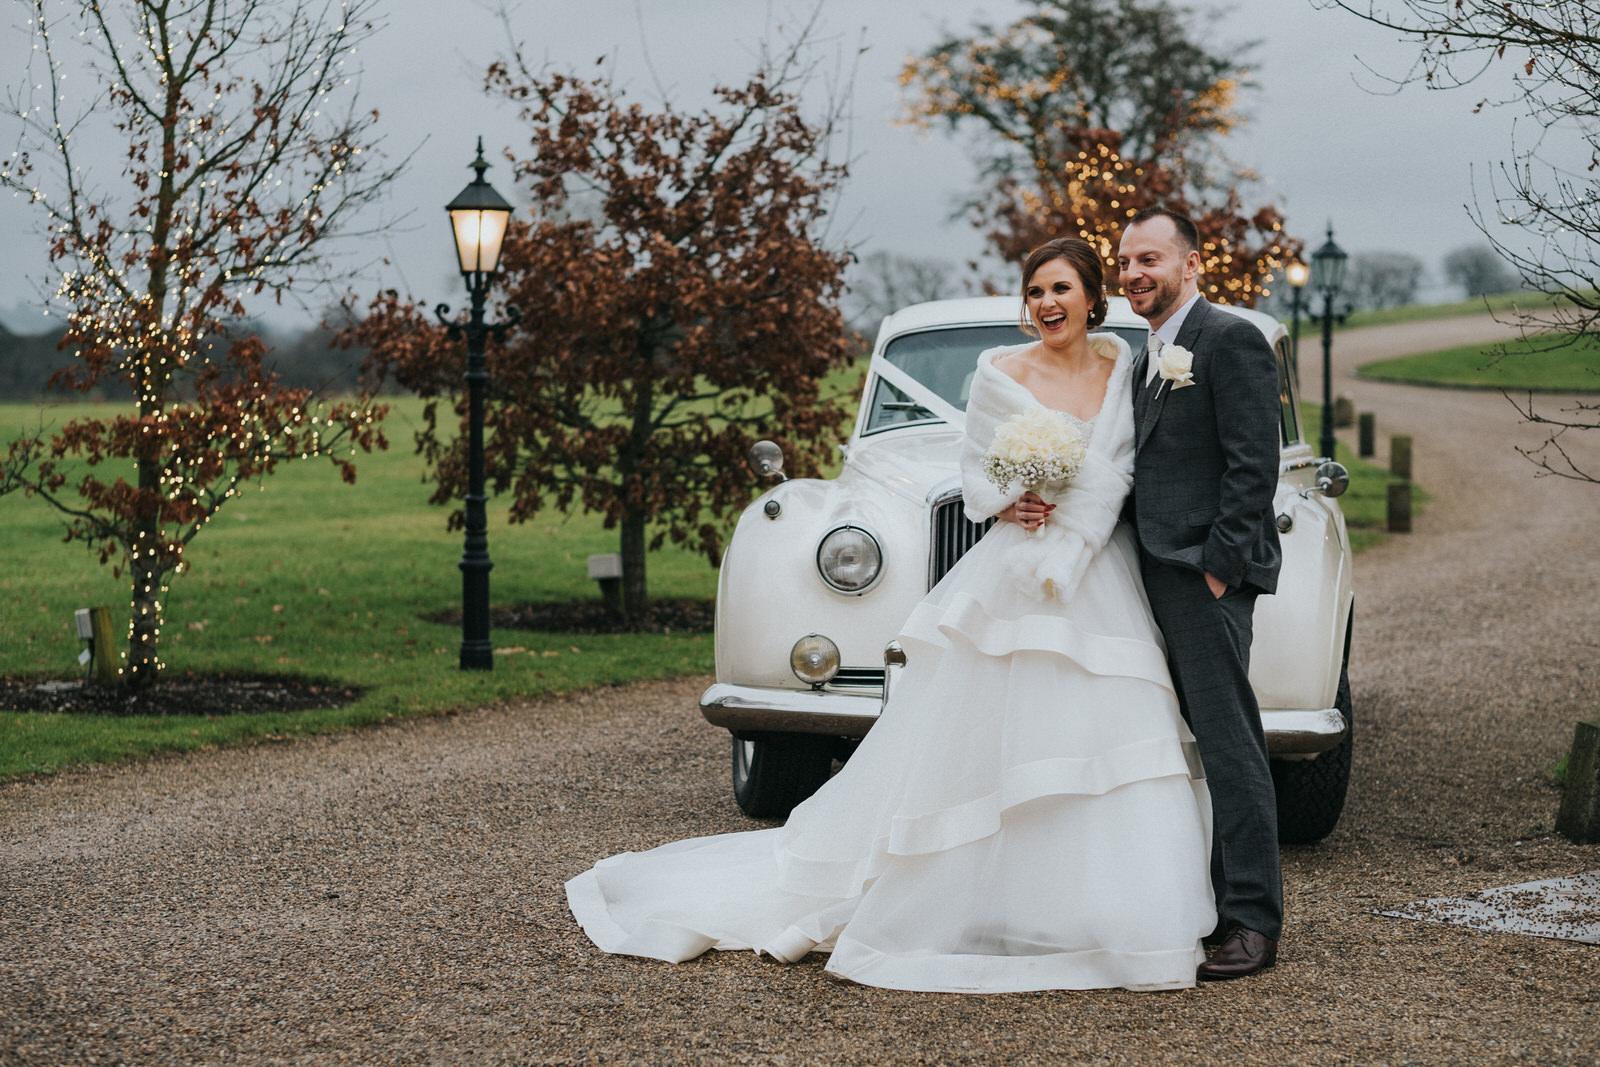 Clonabreany_wedding-photographer_roger_kenny_ireland_065.jpg